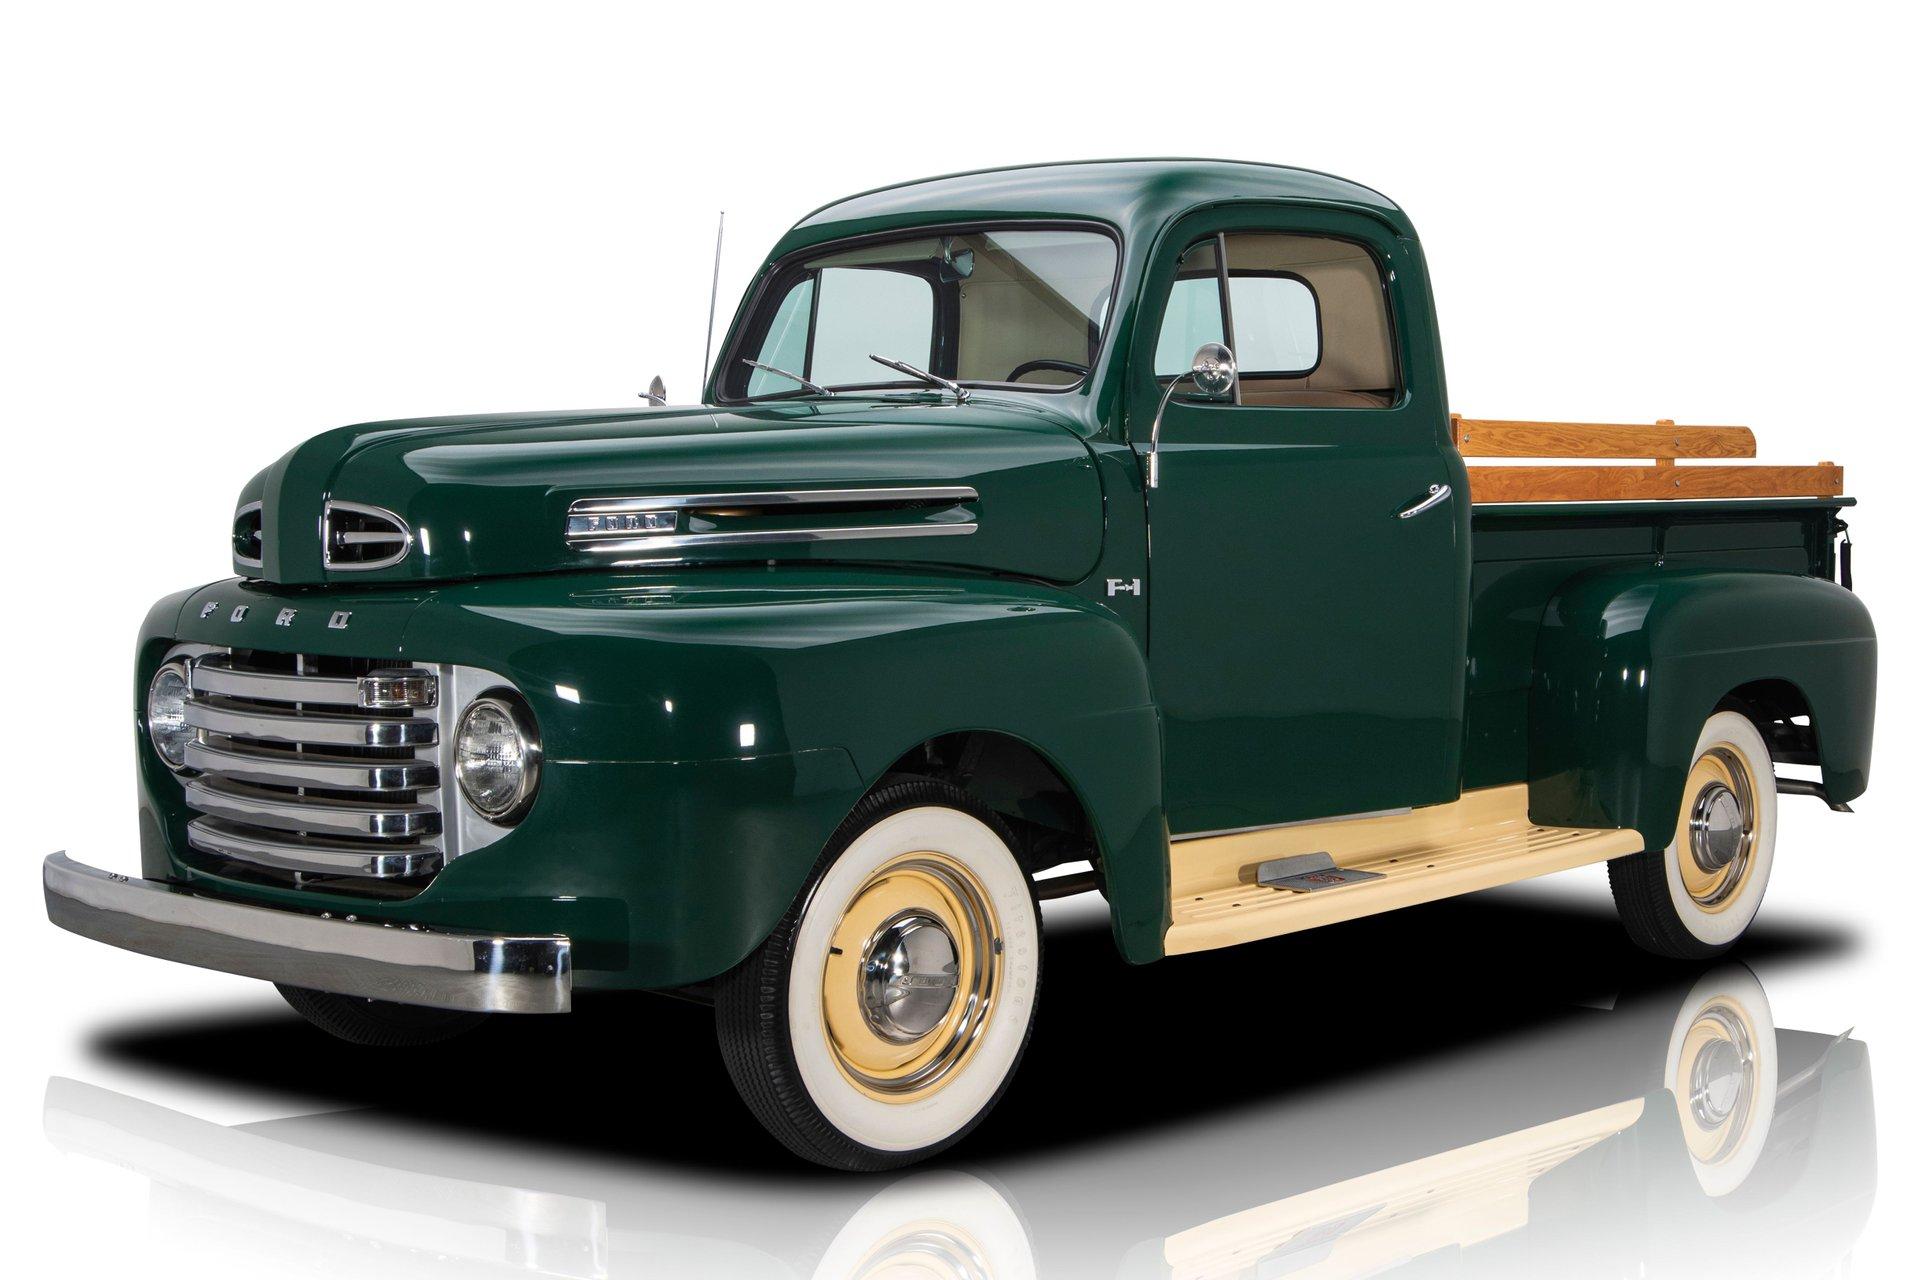 1949 ford f1 pickup truck